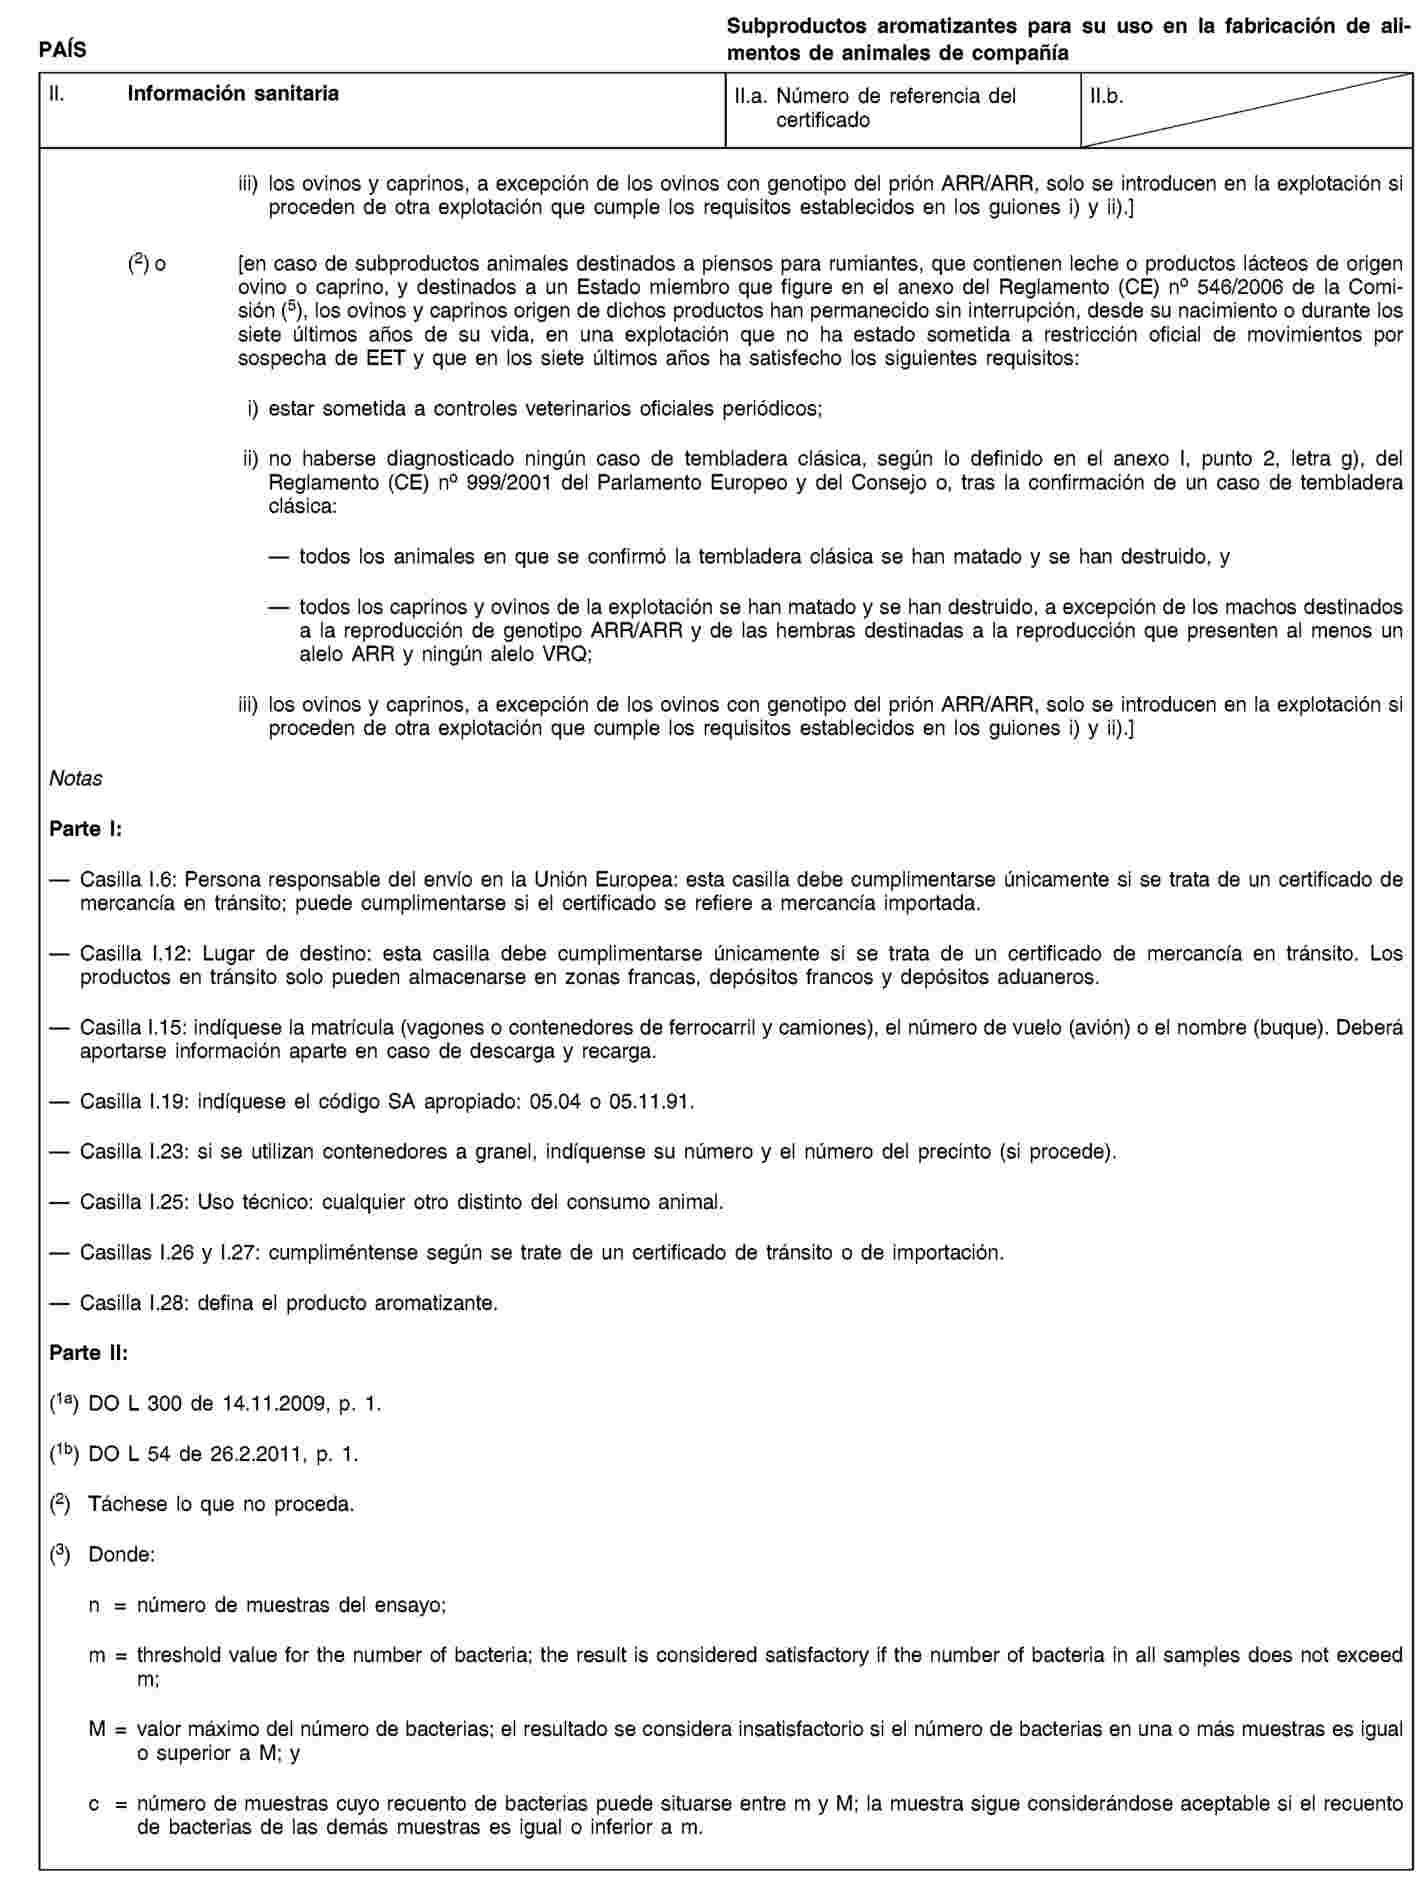 Imagen: https://eur-lex.europa.eu/resource.html?uri=uriserv:OJ.L_.2011.054.01.0001.01.SPA.xhtml.L_2011054ES.01015301.tif.jpg